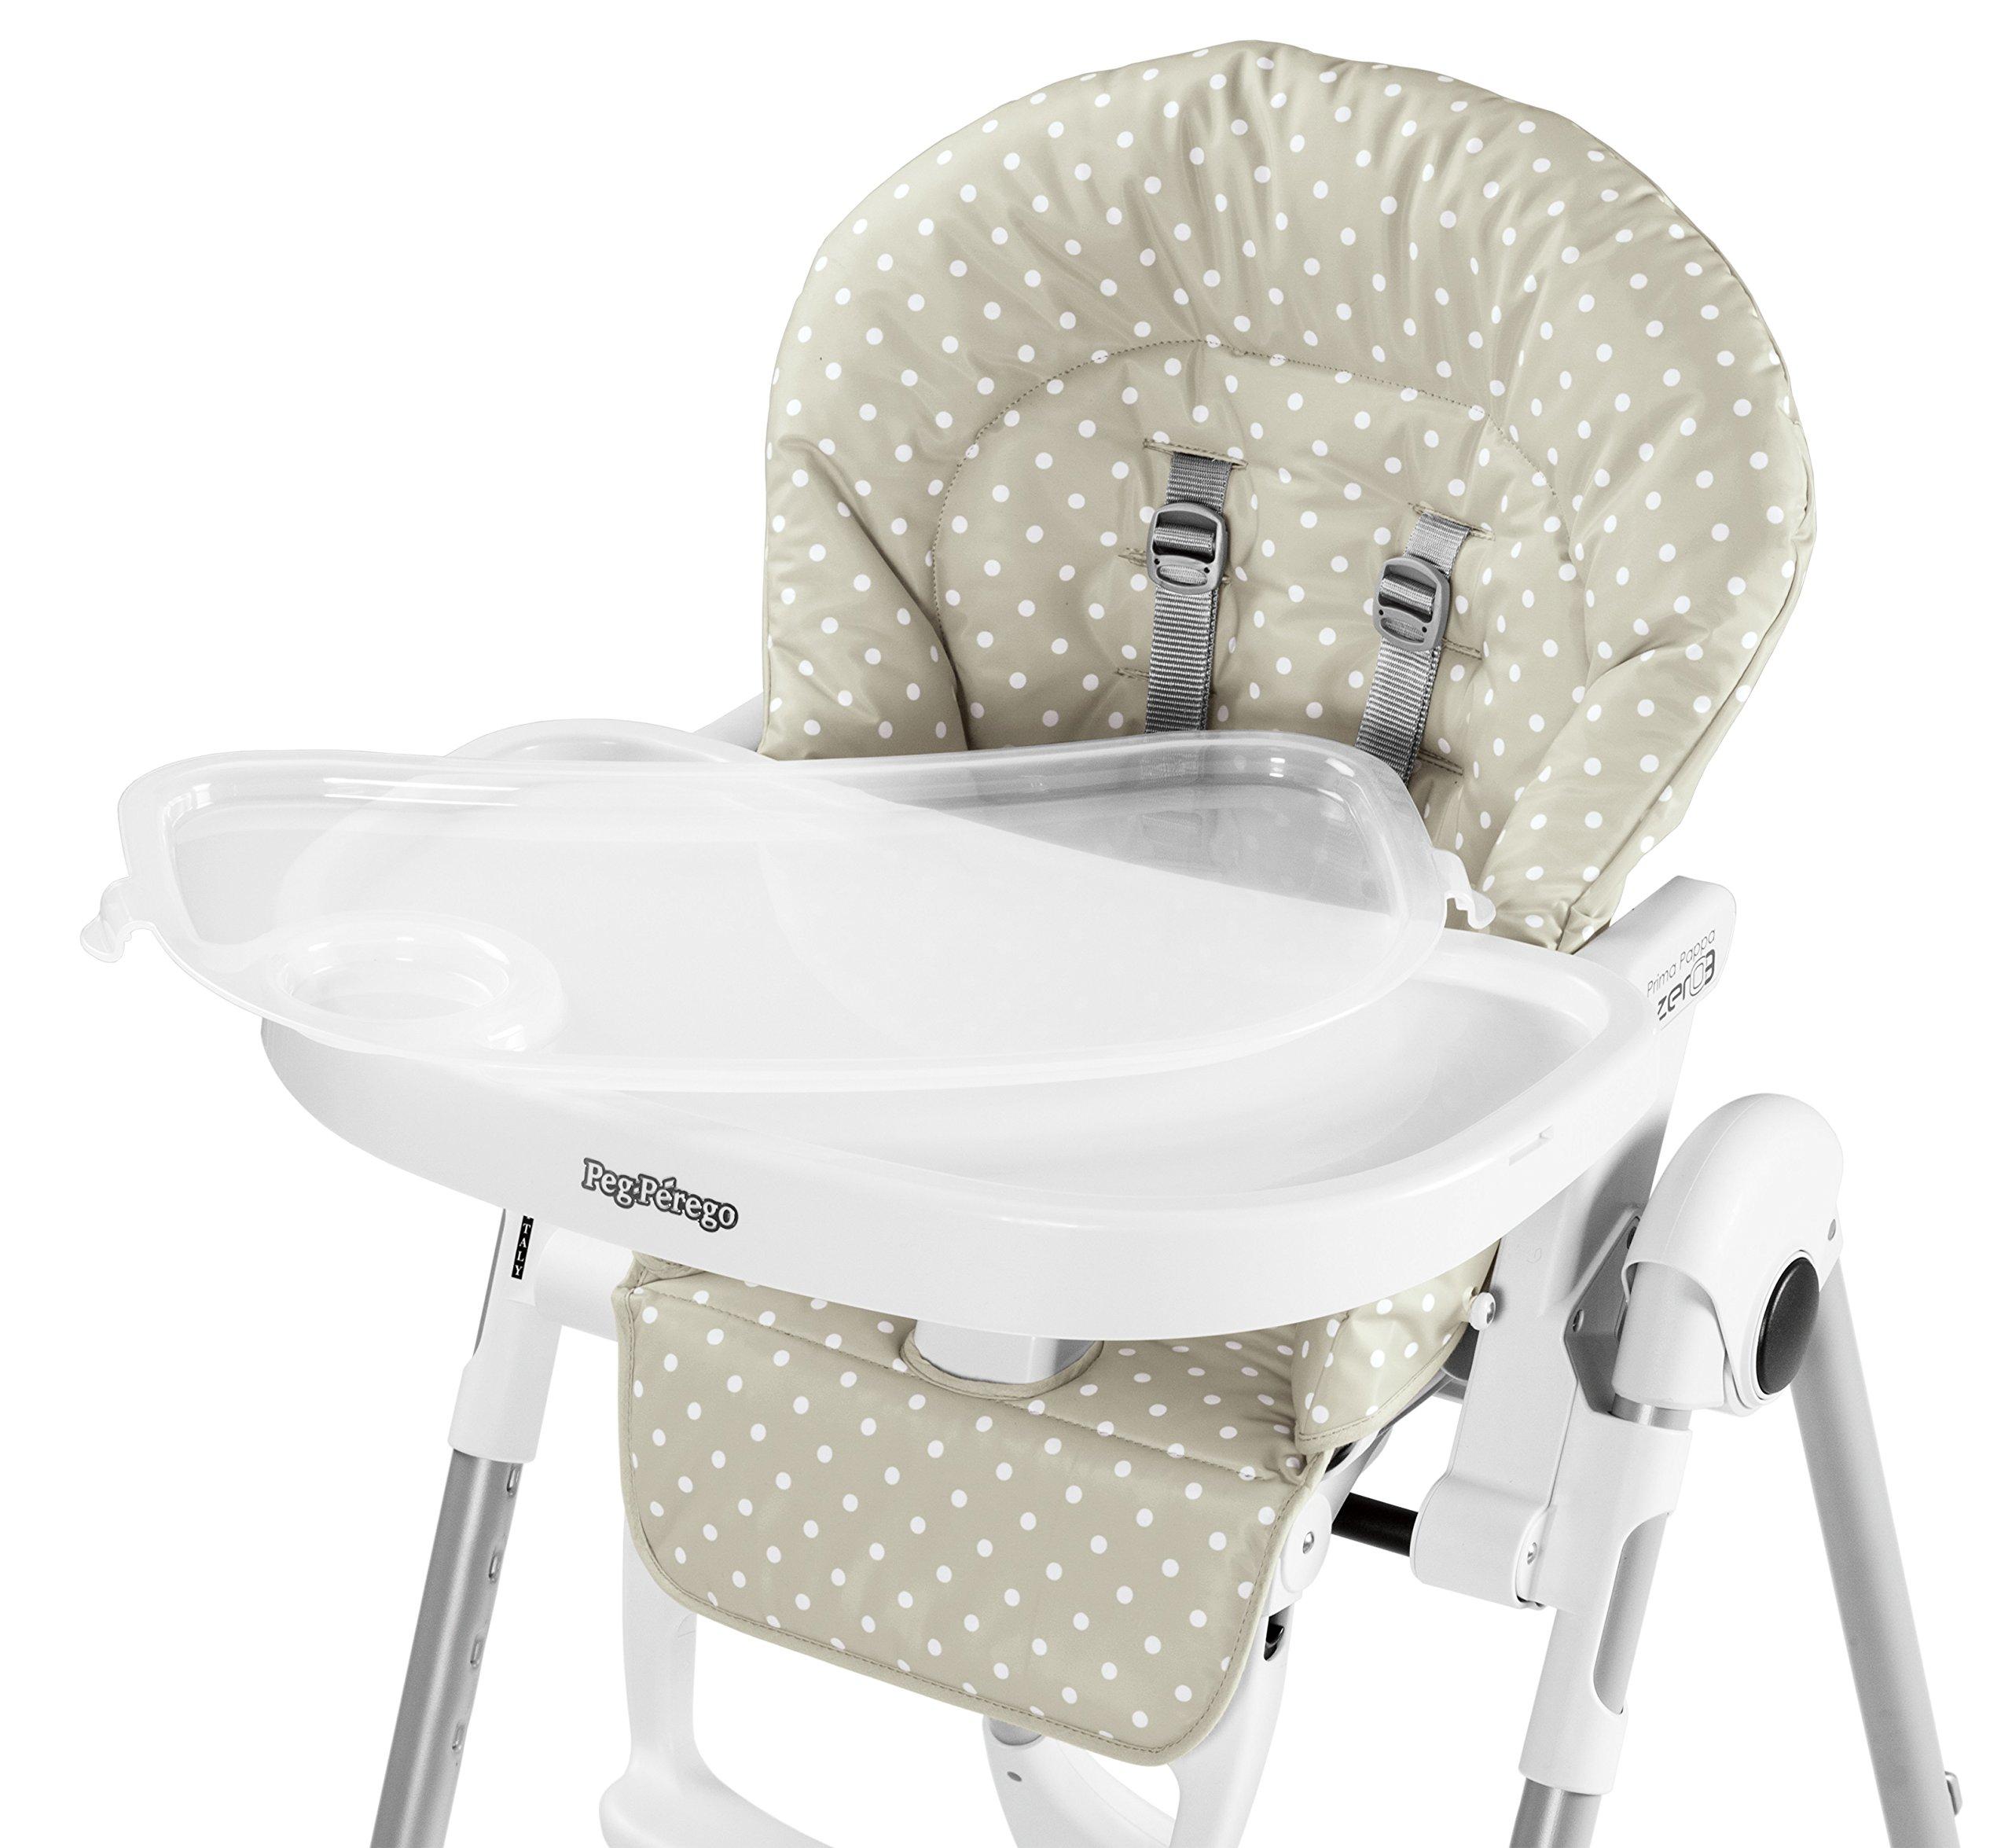 Peg Perego USA Prima Pappa Zero 3 High Chair, Baby Dot Beige